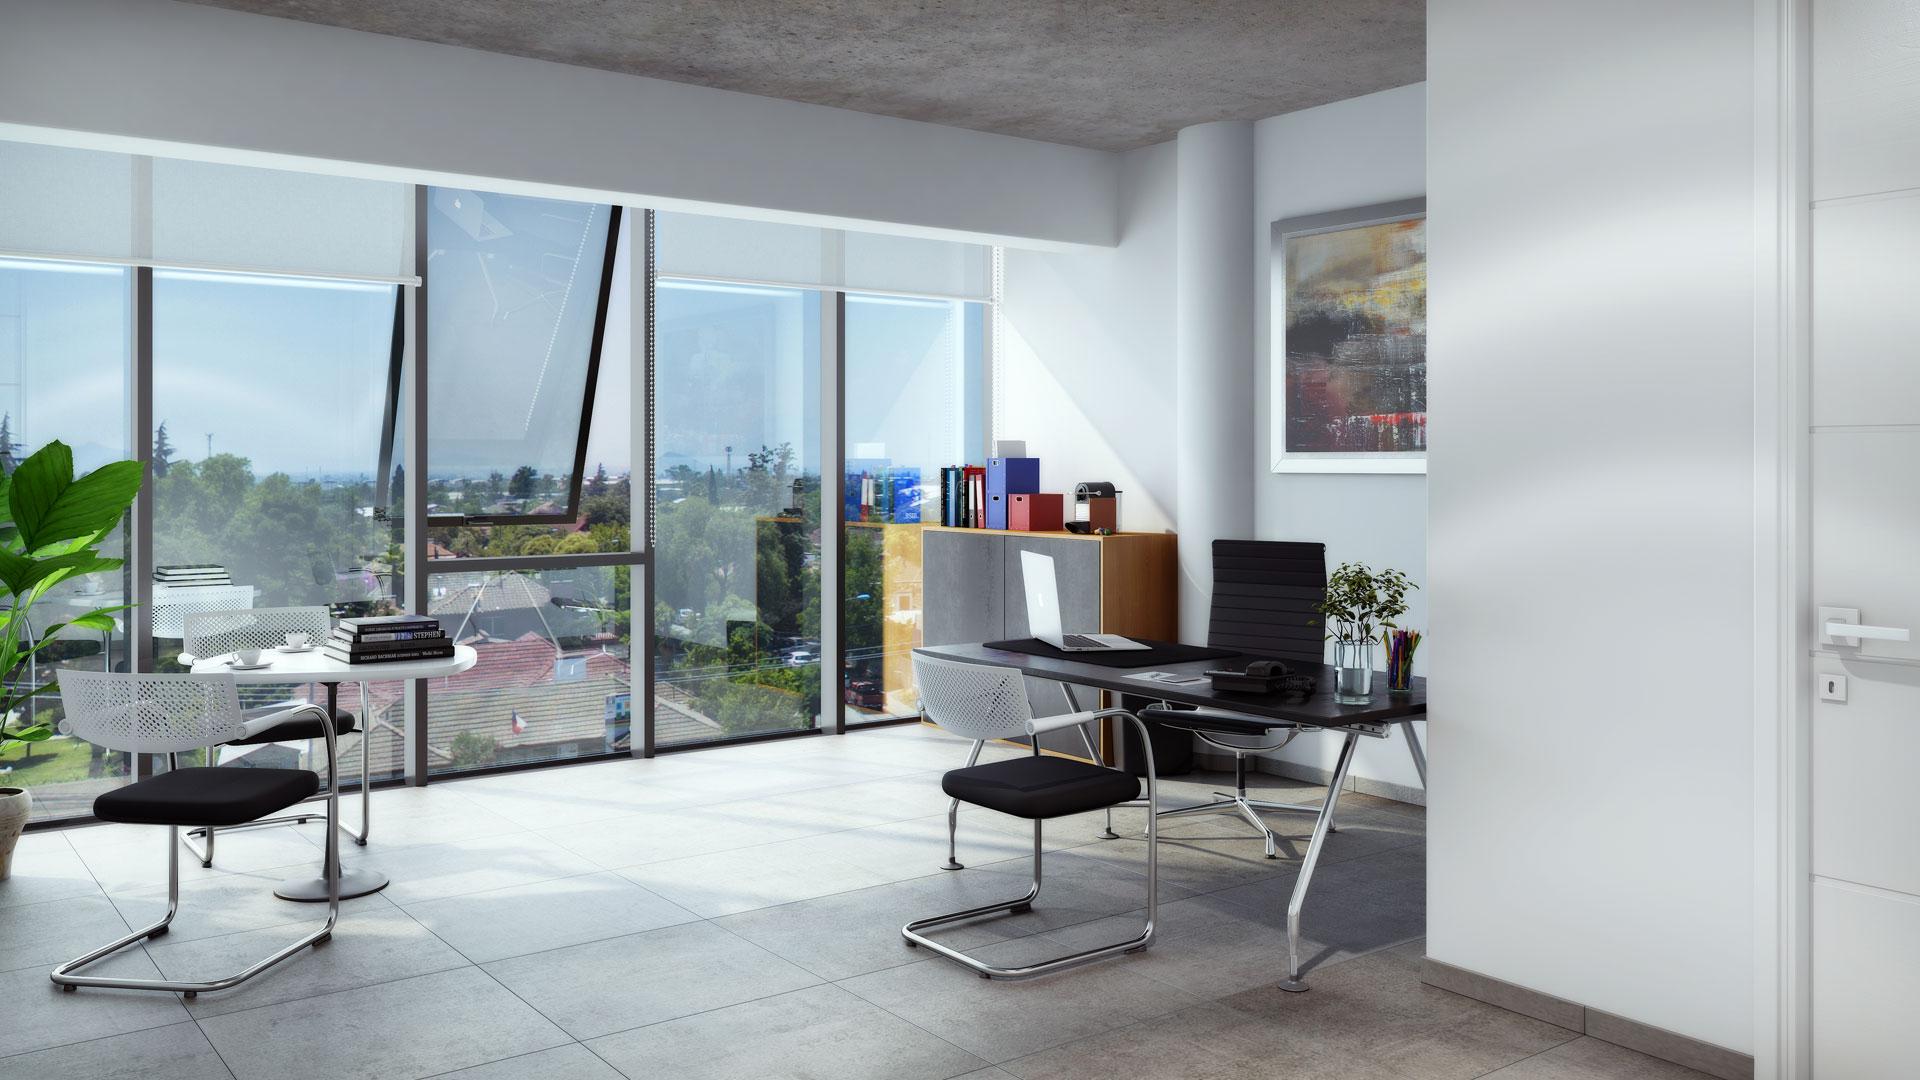 Membrillar_Cam-interior-oficina-final